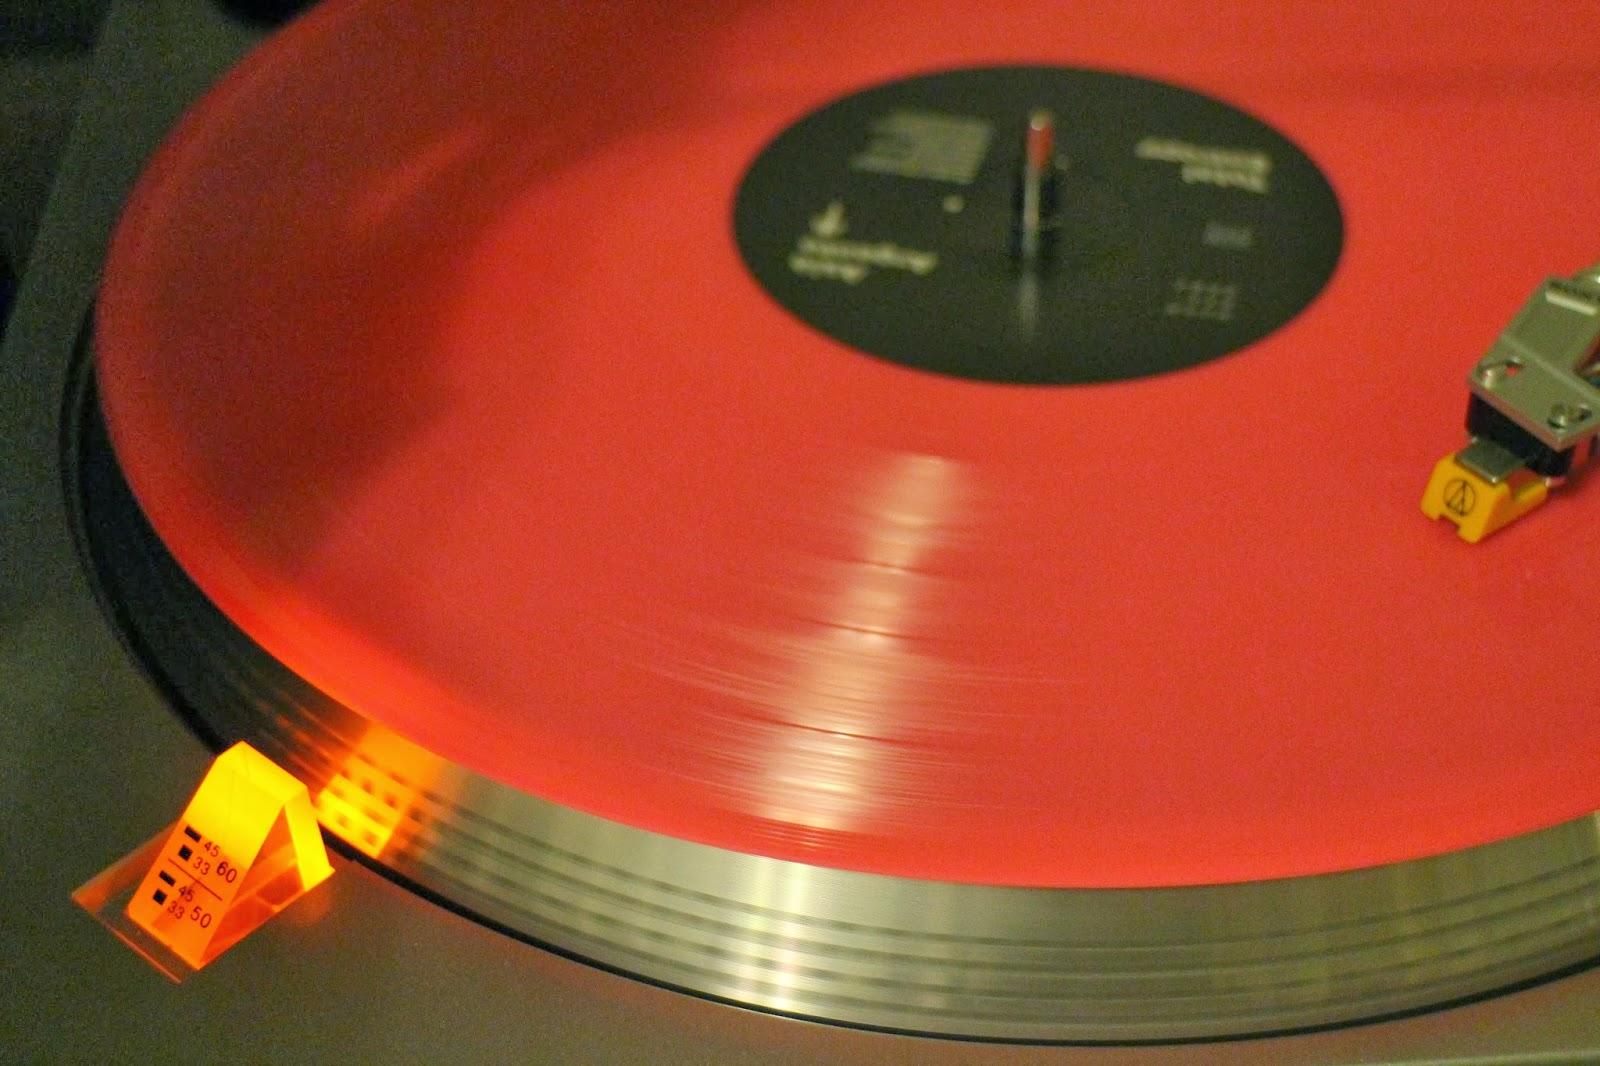 Asia Argento Total Entropy vinyl LP, pink vinyl, glowing vinyl record spinning